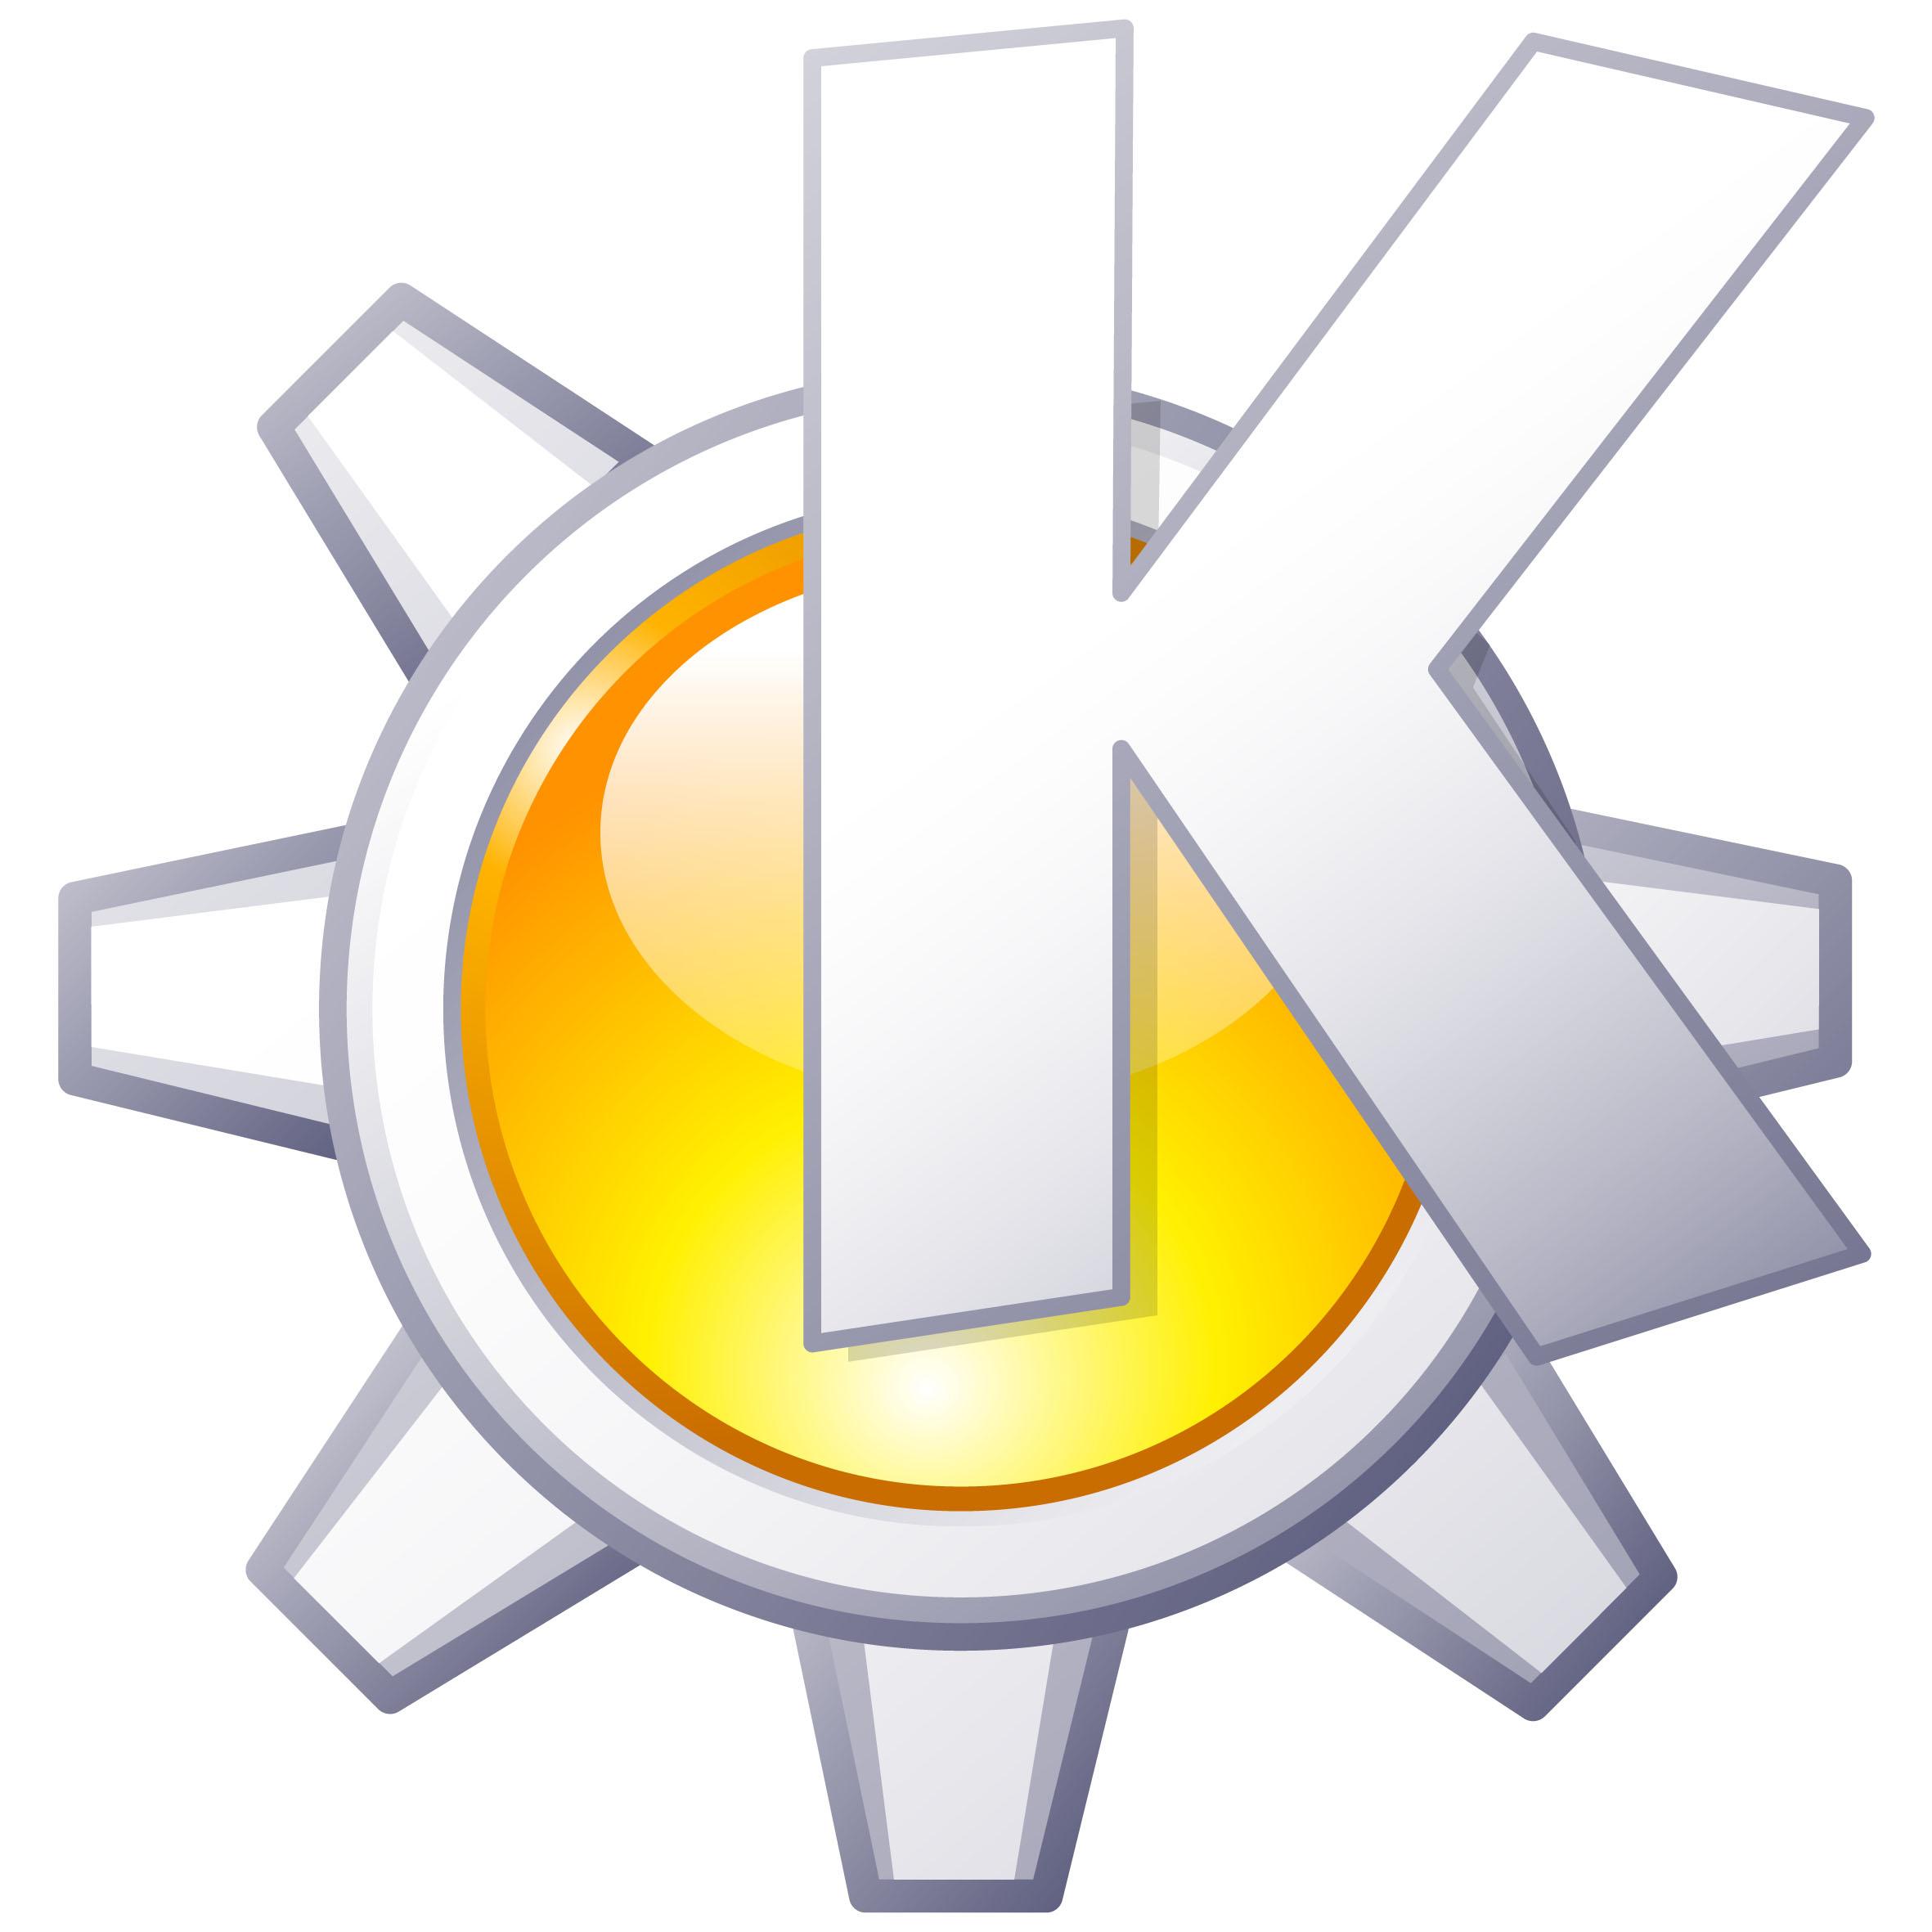 Index of /stuff/clipart